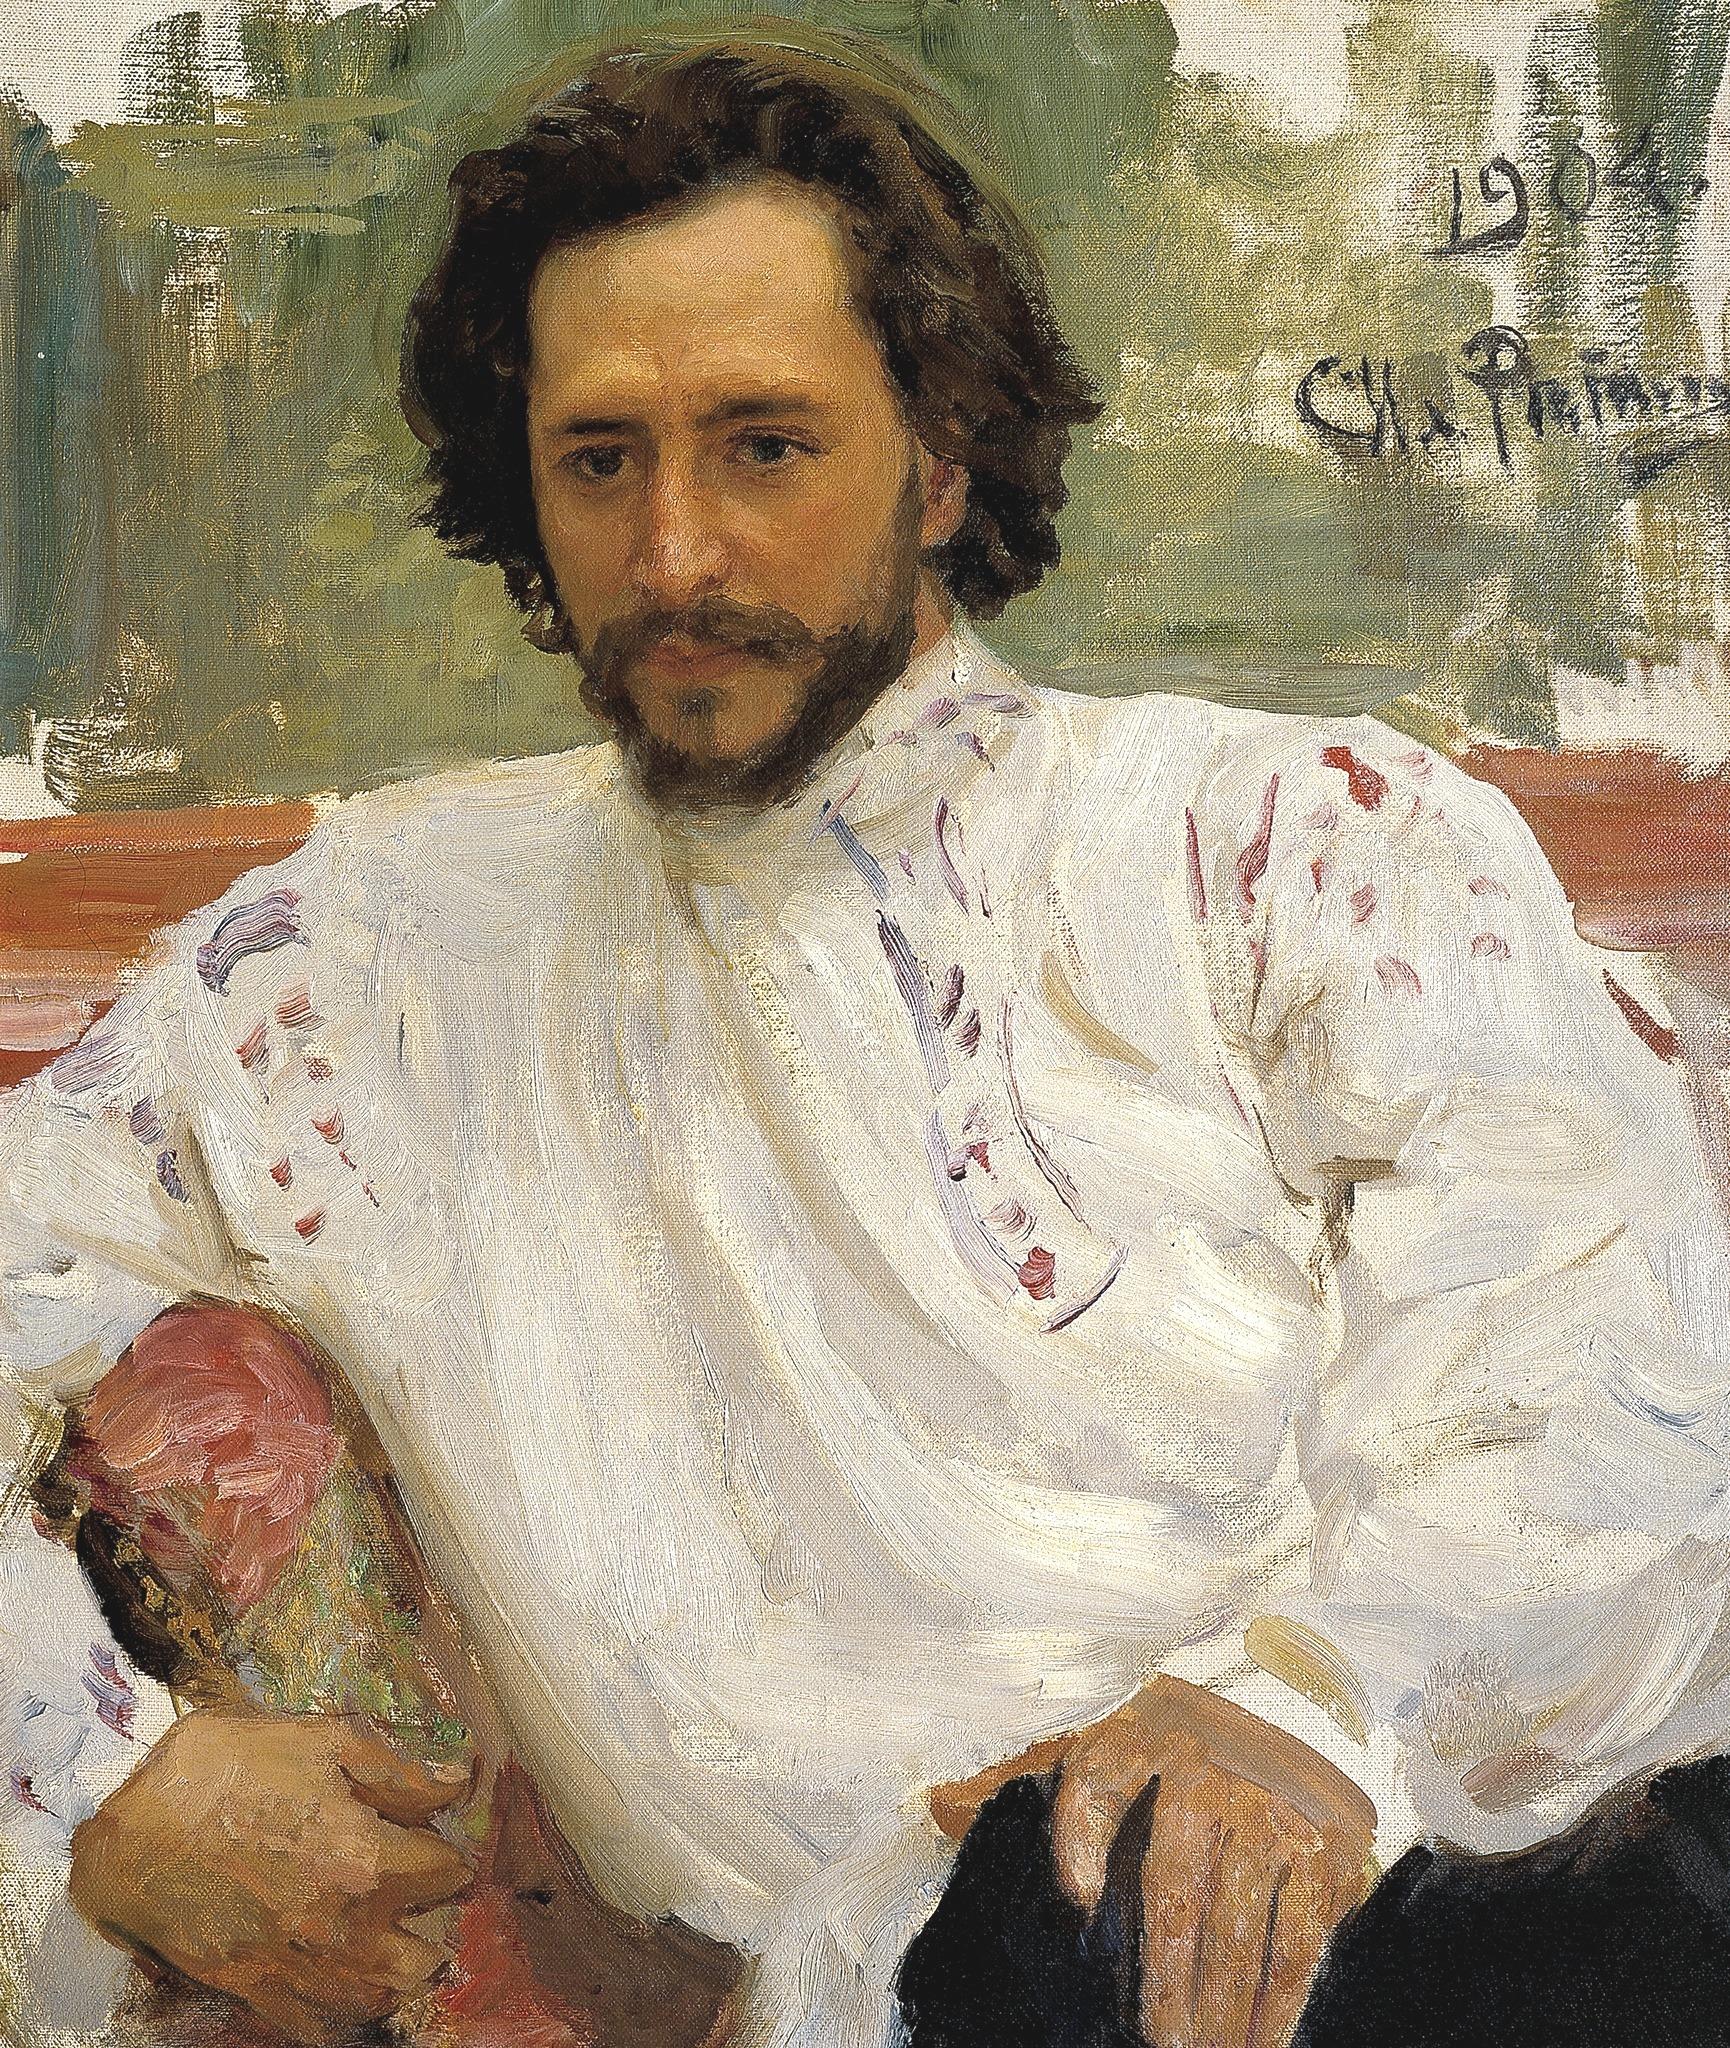 Portrait of Andreyev by [[Ilya Repin]]